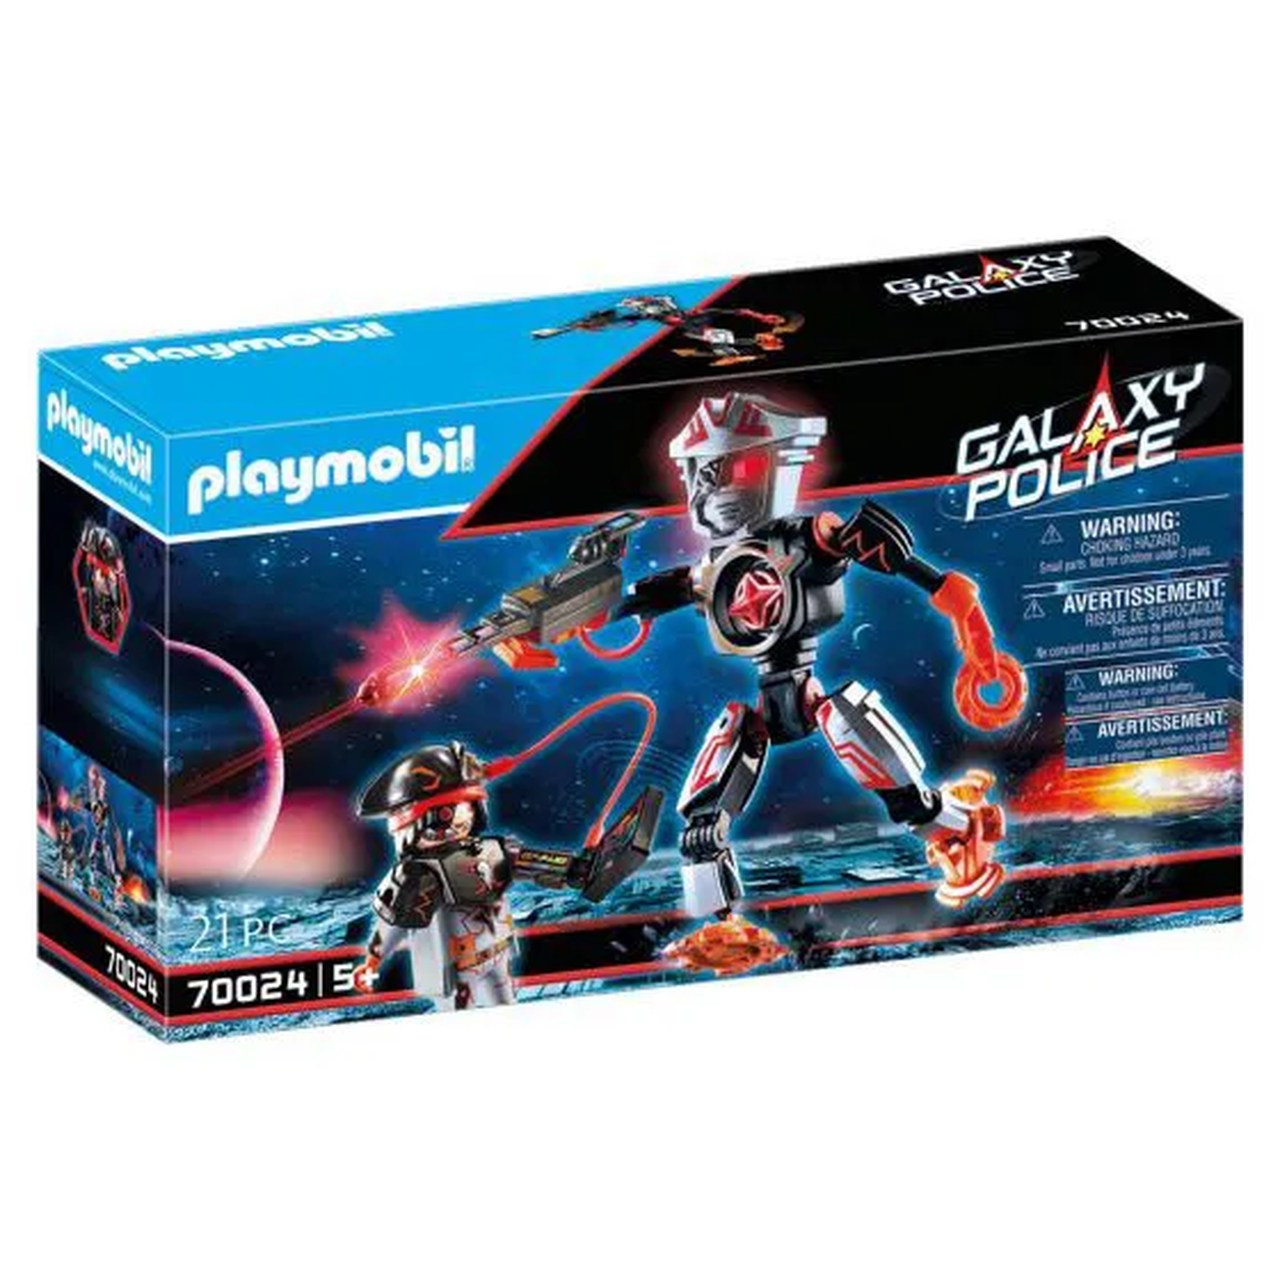 Playmobil Pirata Galáctica (21 Peças): Playmobil Galaxy Police (70024) - Sunny